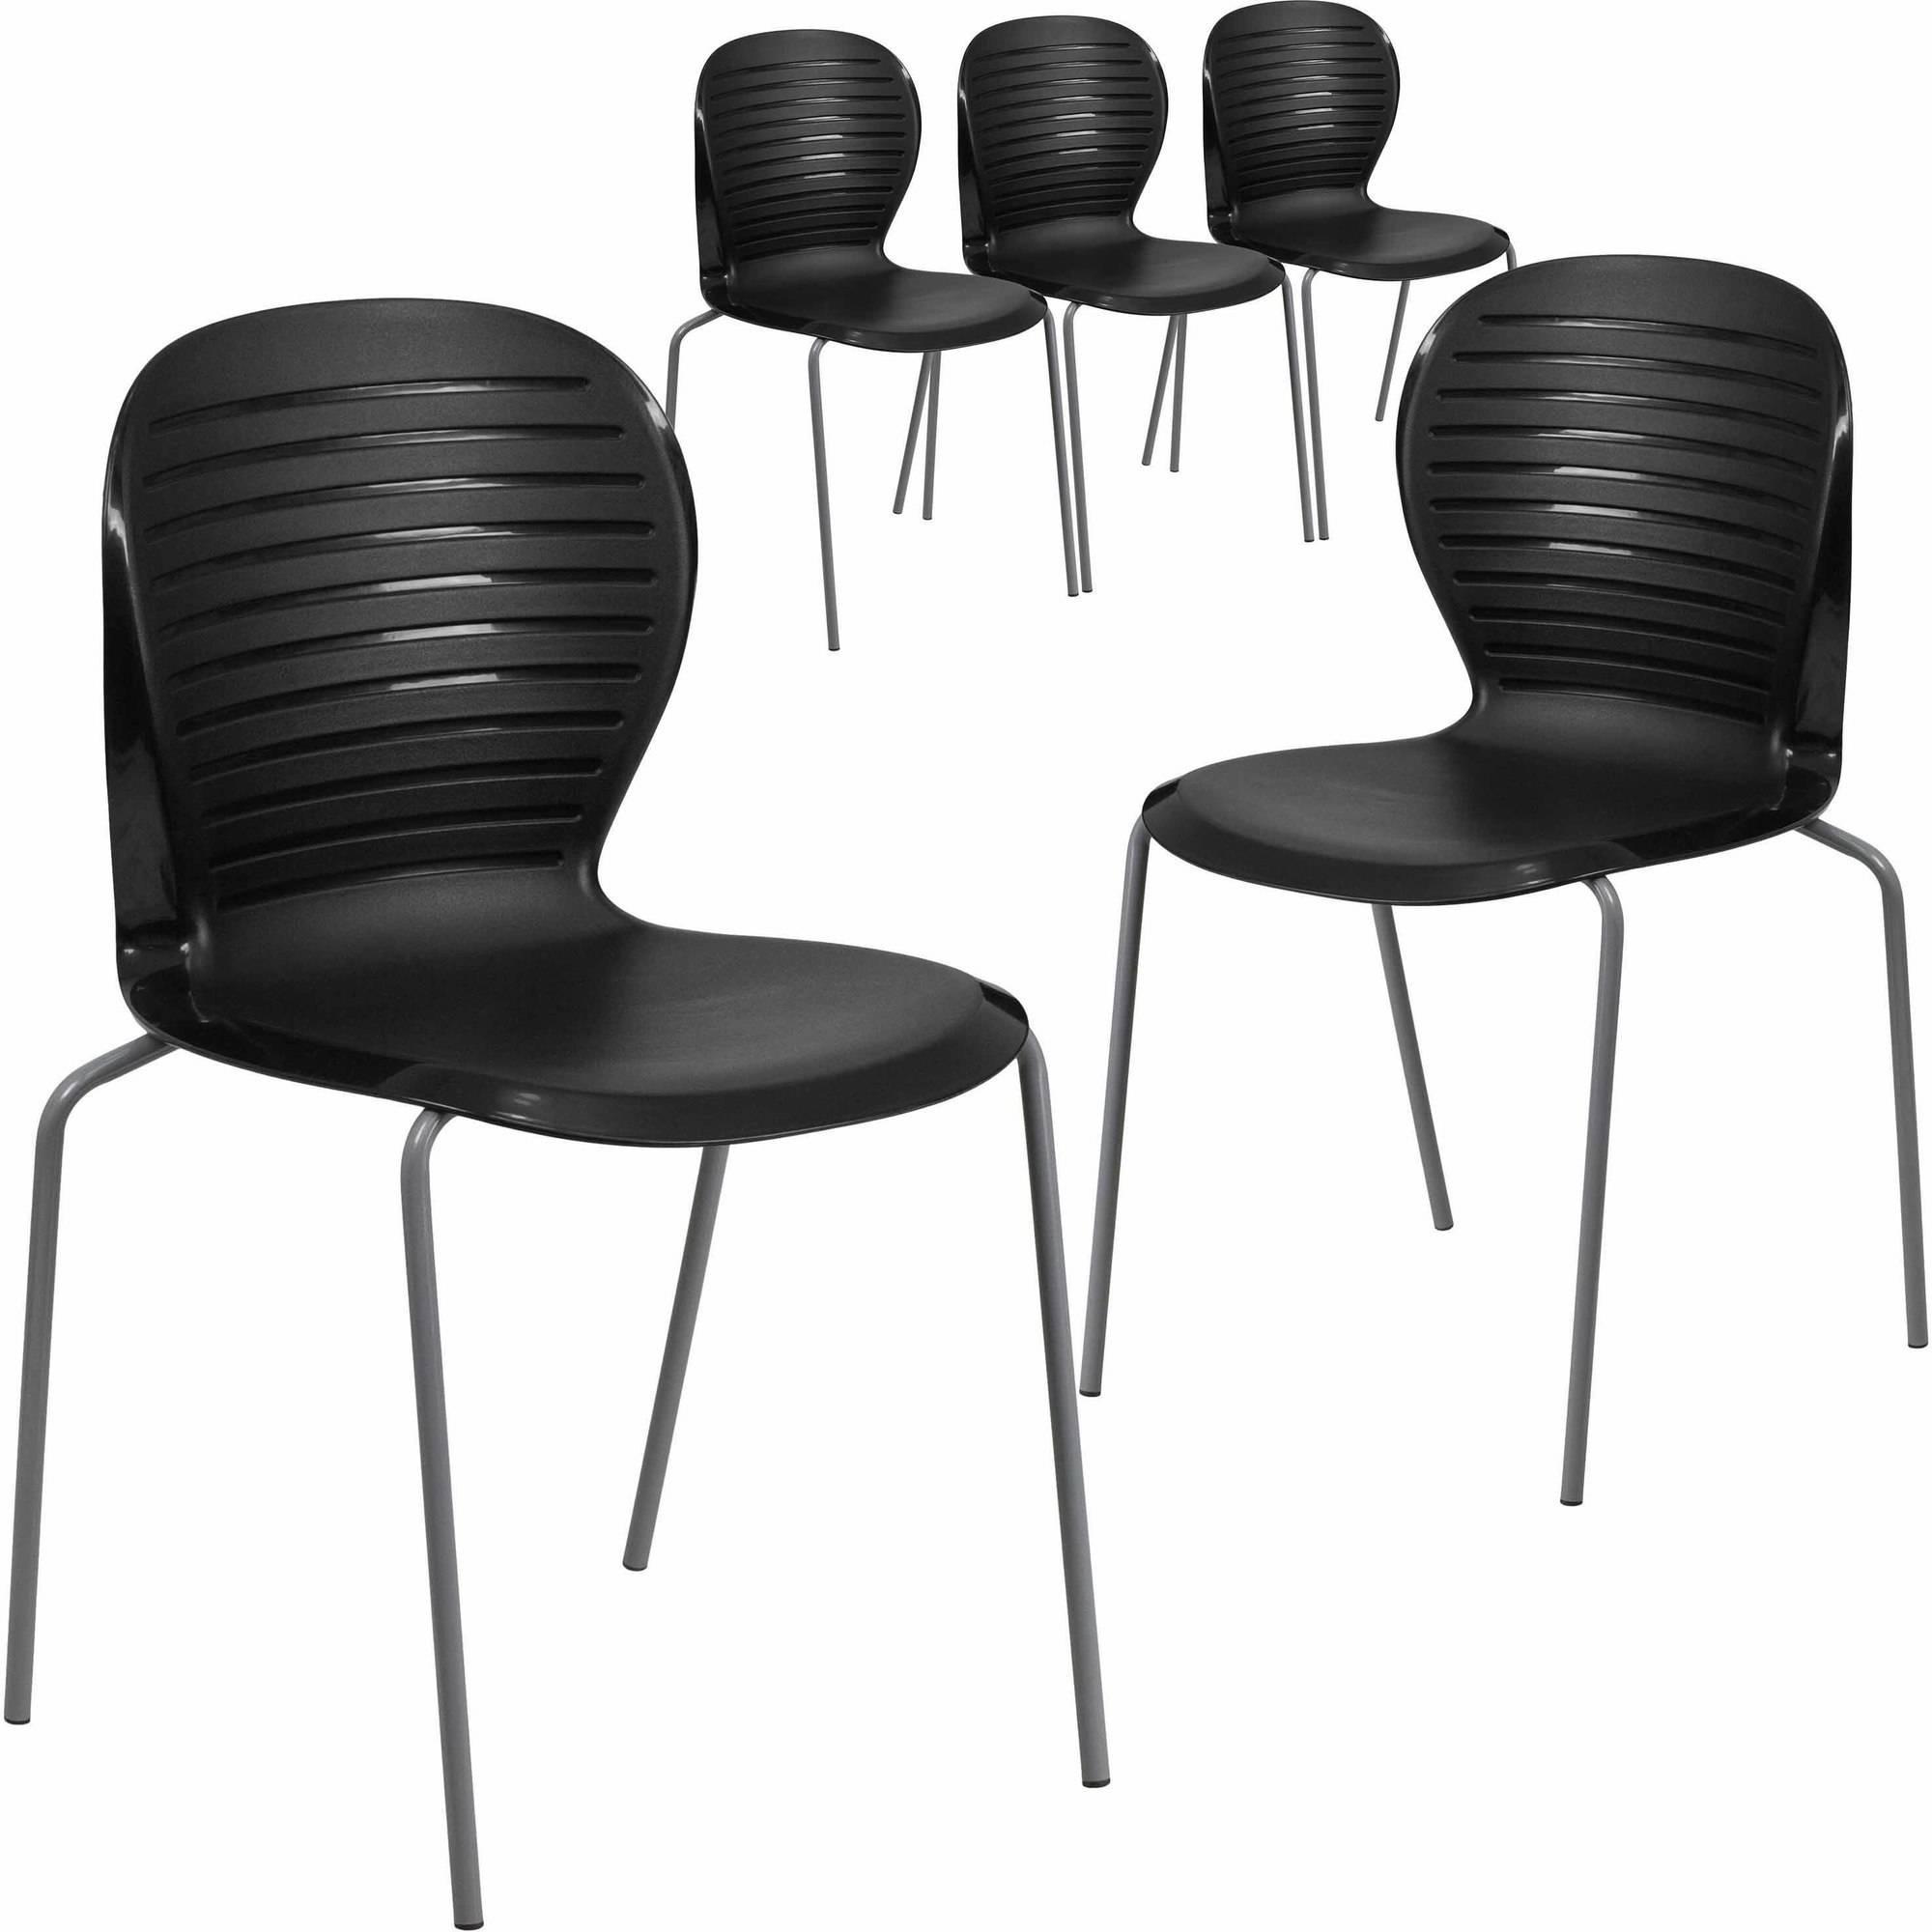 Flash Furniture 5-Pack HERCULES Series 551 lb Capacity Stack Chair, Multiple Colors